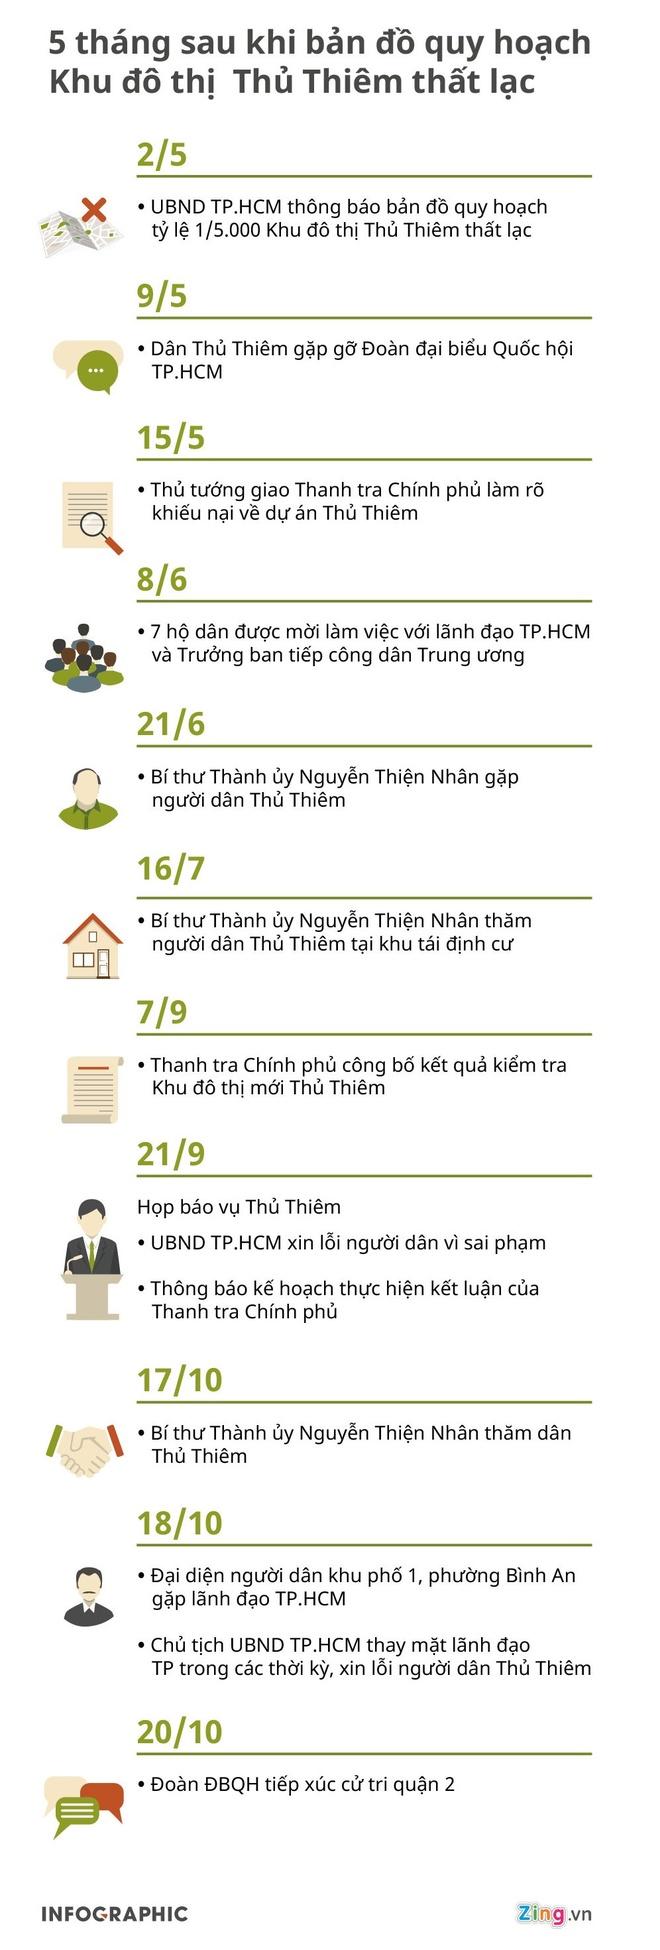 10 noi dung can dieu chinh trong chinh sach boi thuong tai Thu Thiem hinh anh 3